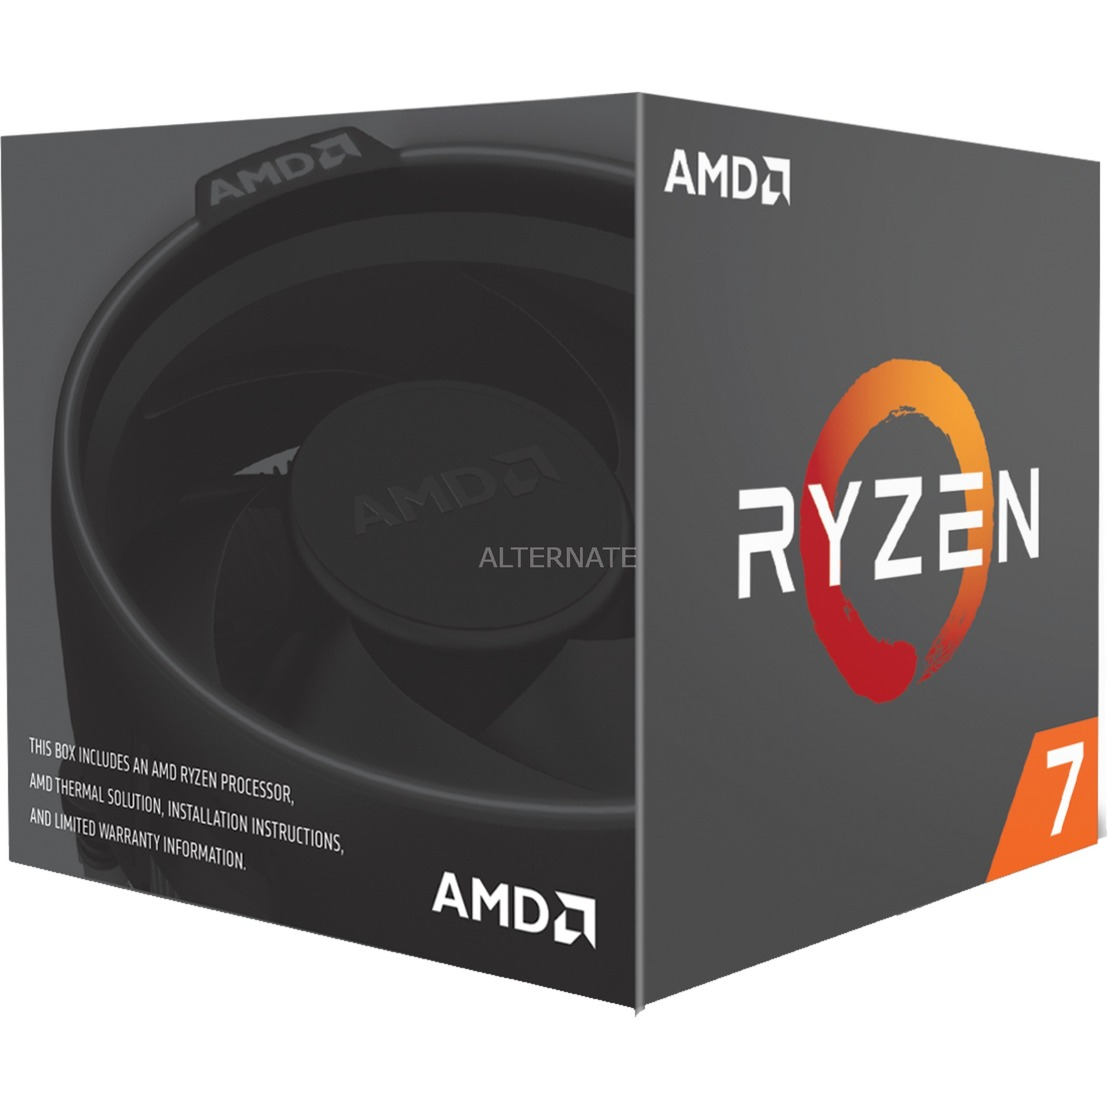 Ryzen 7 2700, Prozessor